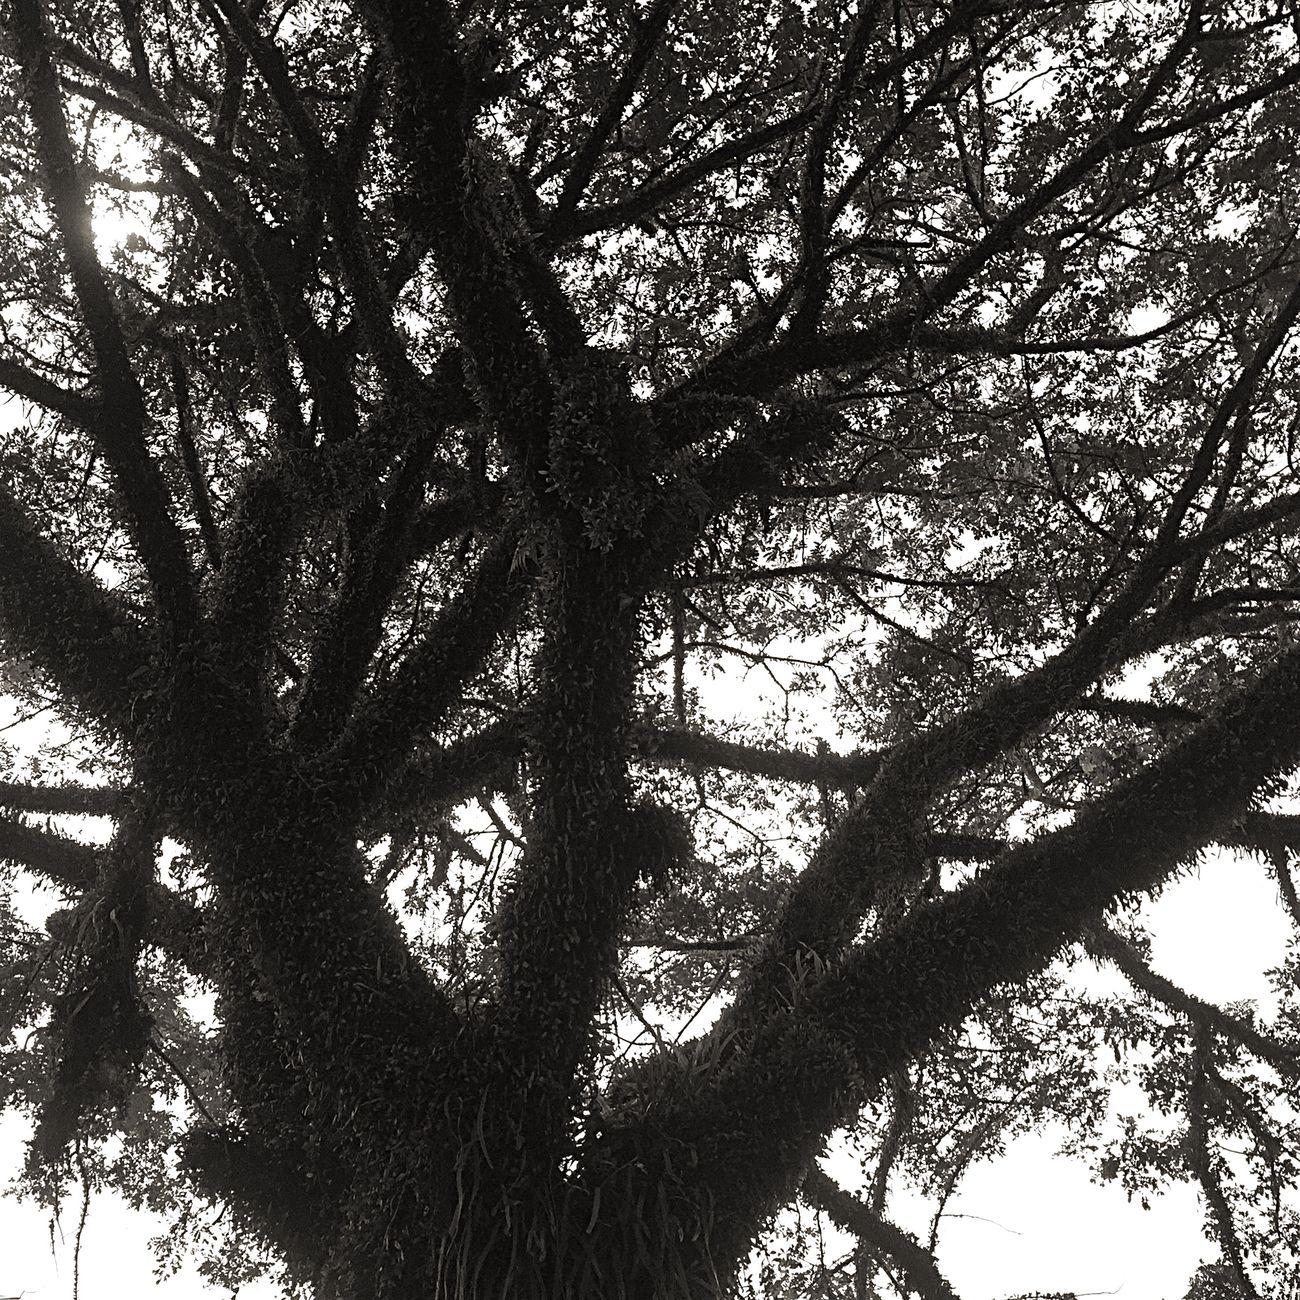 alone... Starting A Trip EyeEm Eye4photography  EyeEmMalaysia EyeEm Nature Lover EyeEm Gallery Trees Nature Blackandwhite Black And White